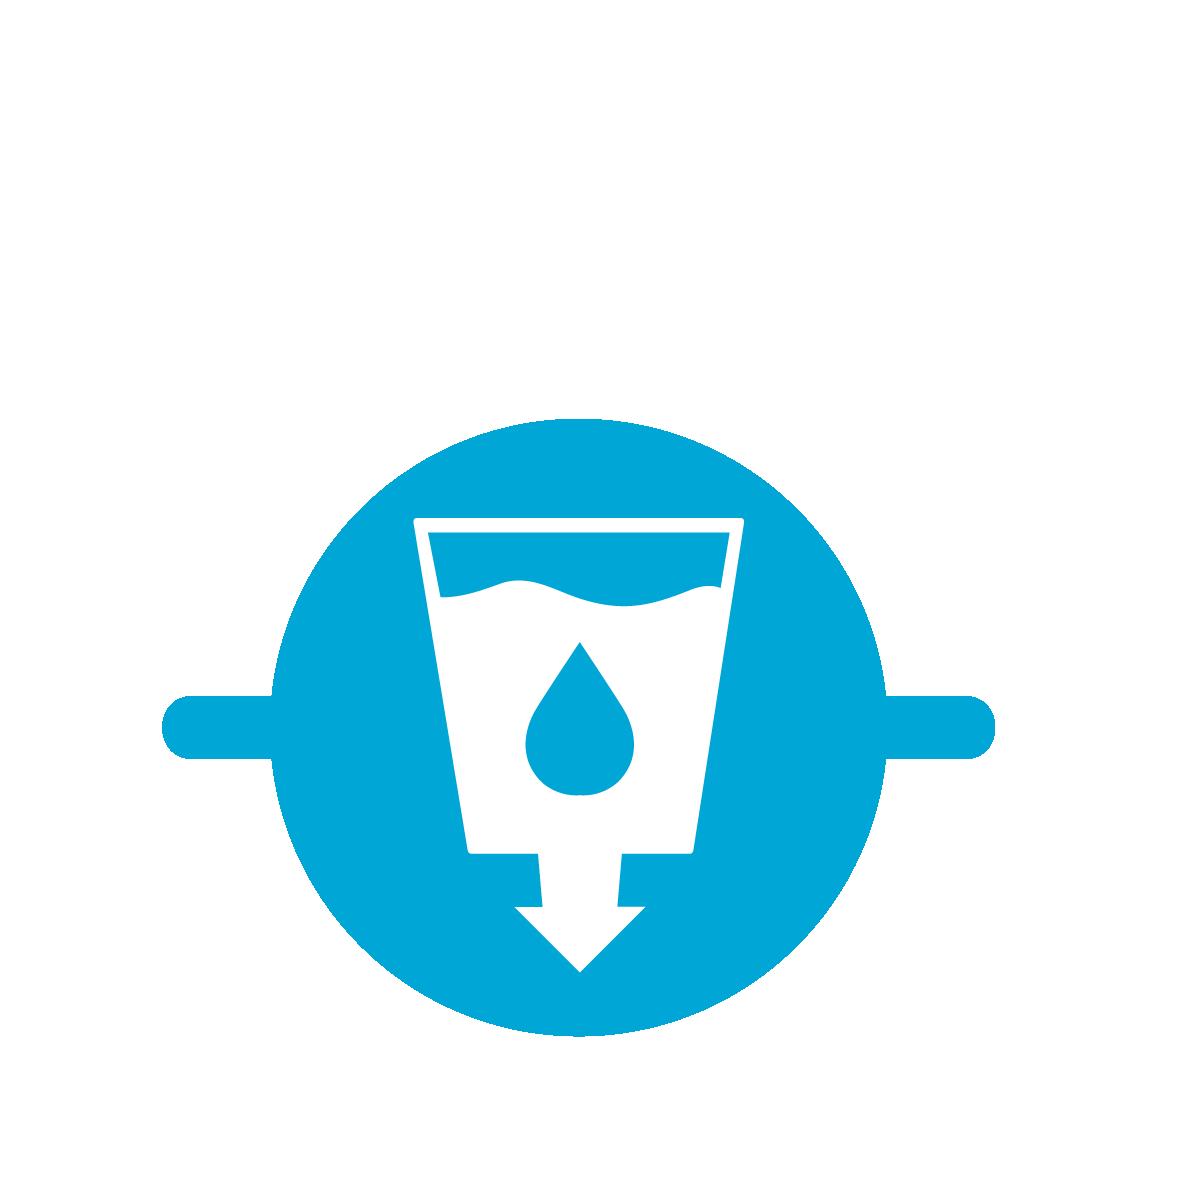 Água potável e sanemaneto